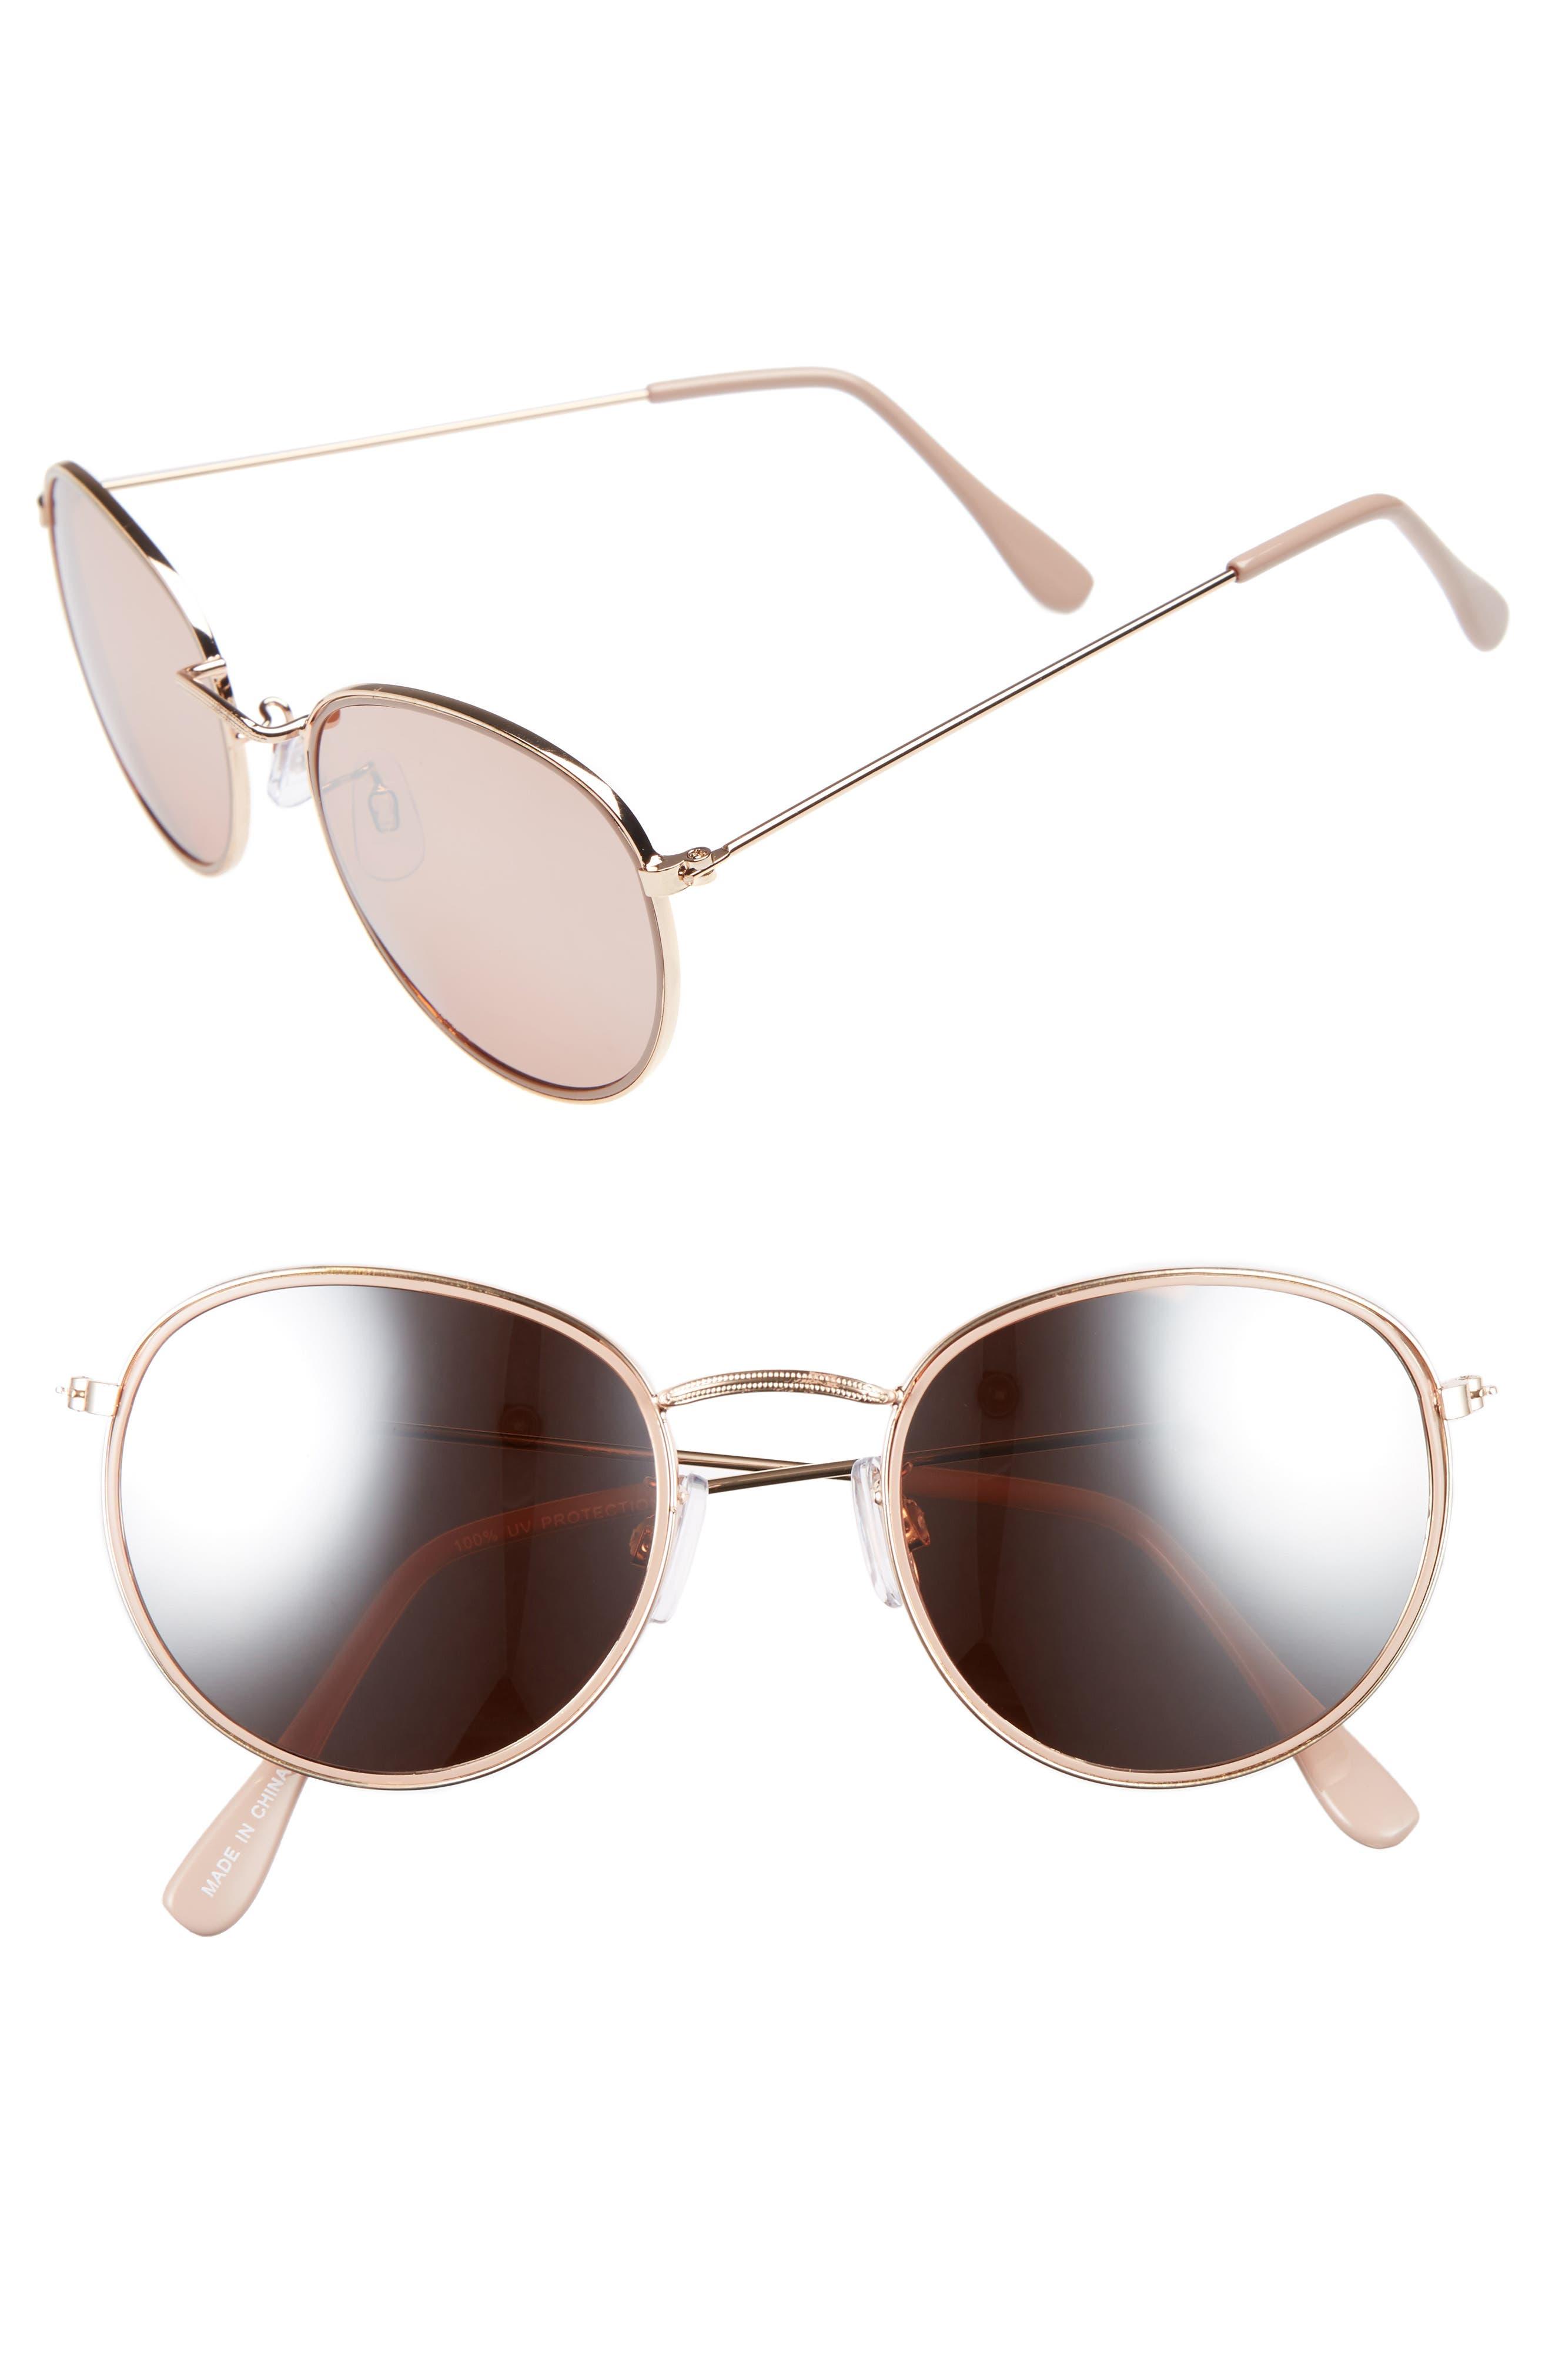 50mm Round Aviator Sunglasses,                             Main thumbnail 1, color,                             Rose Gold